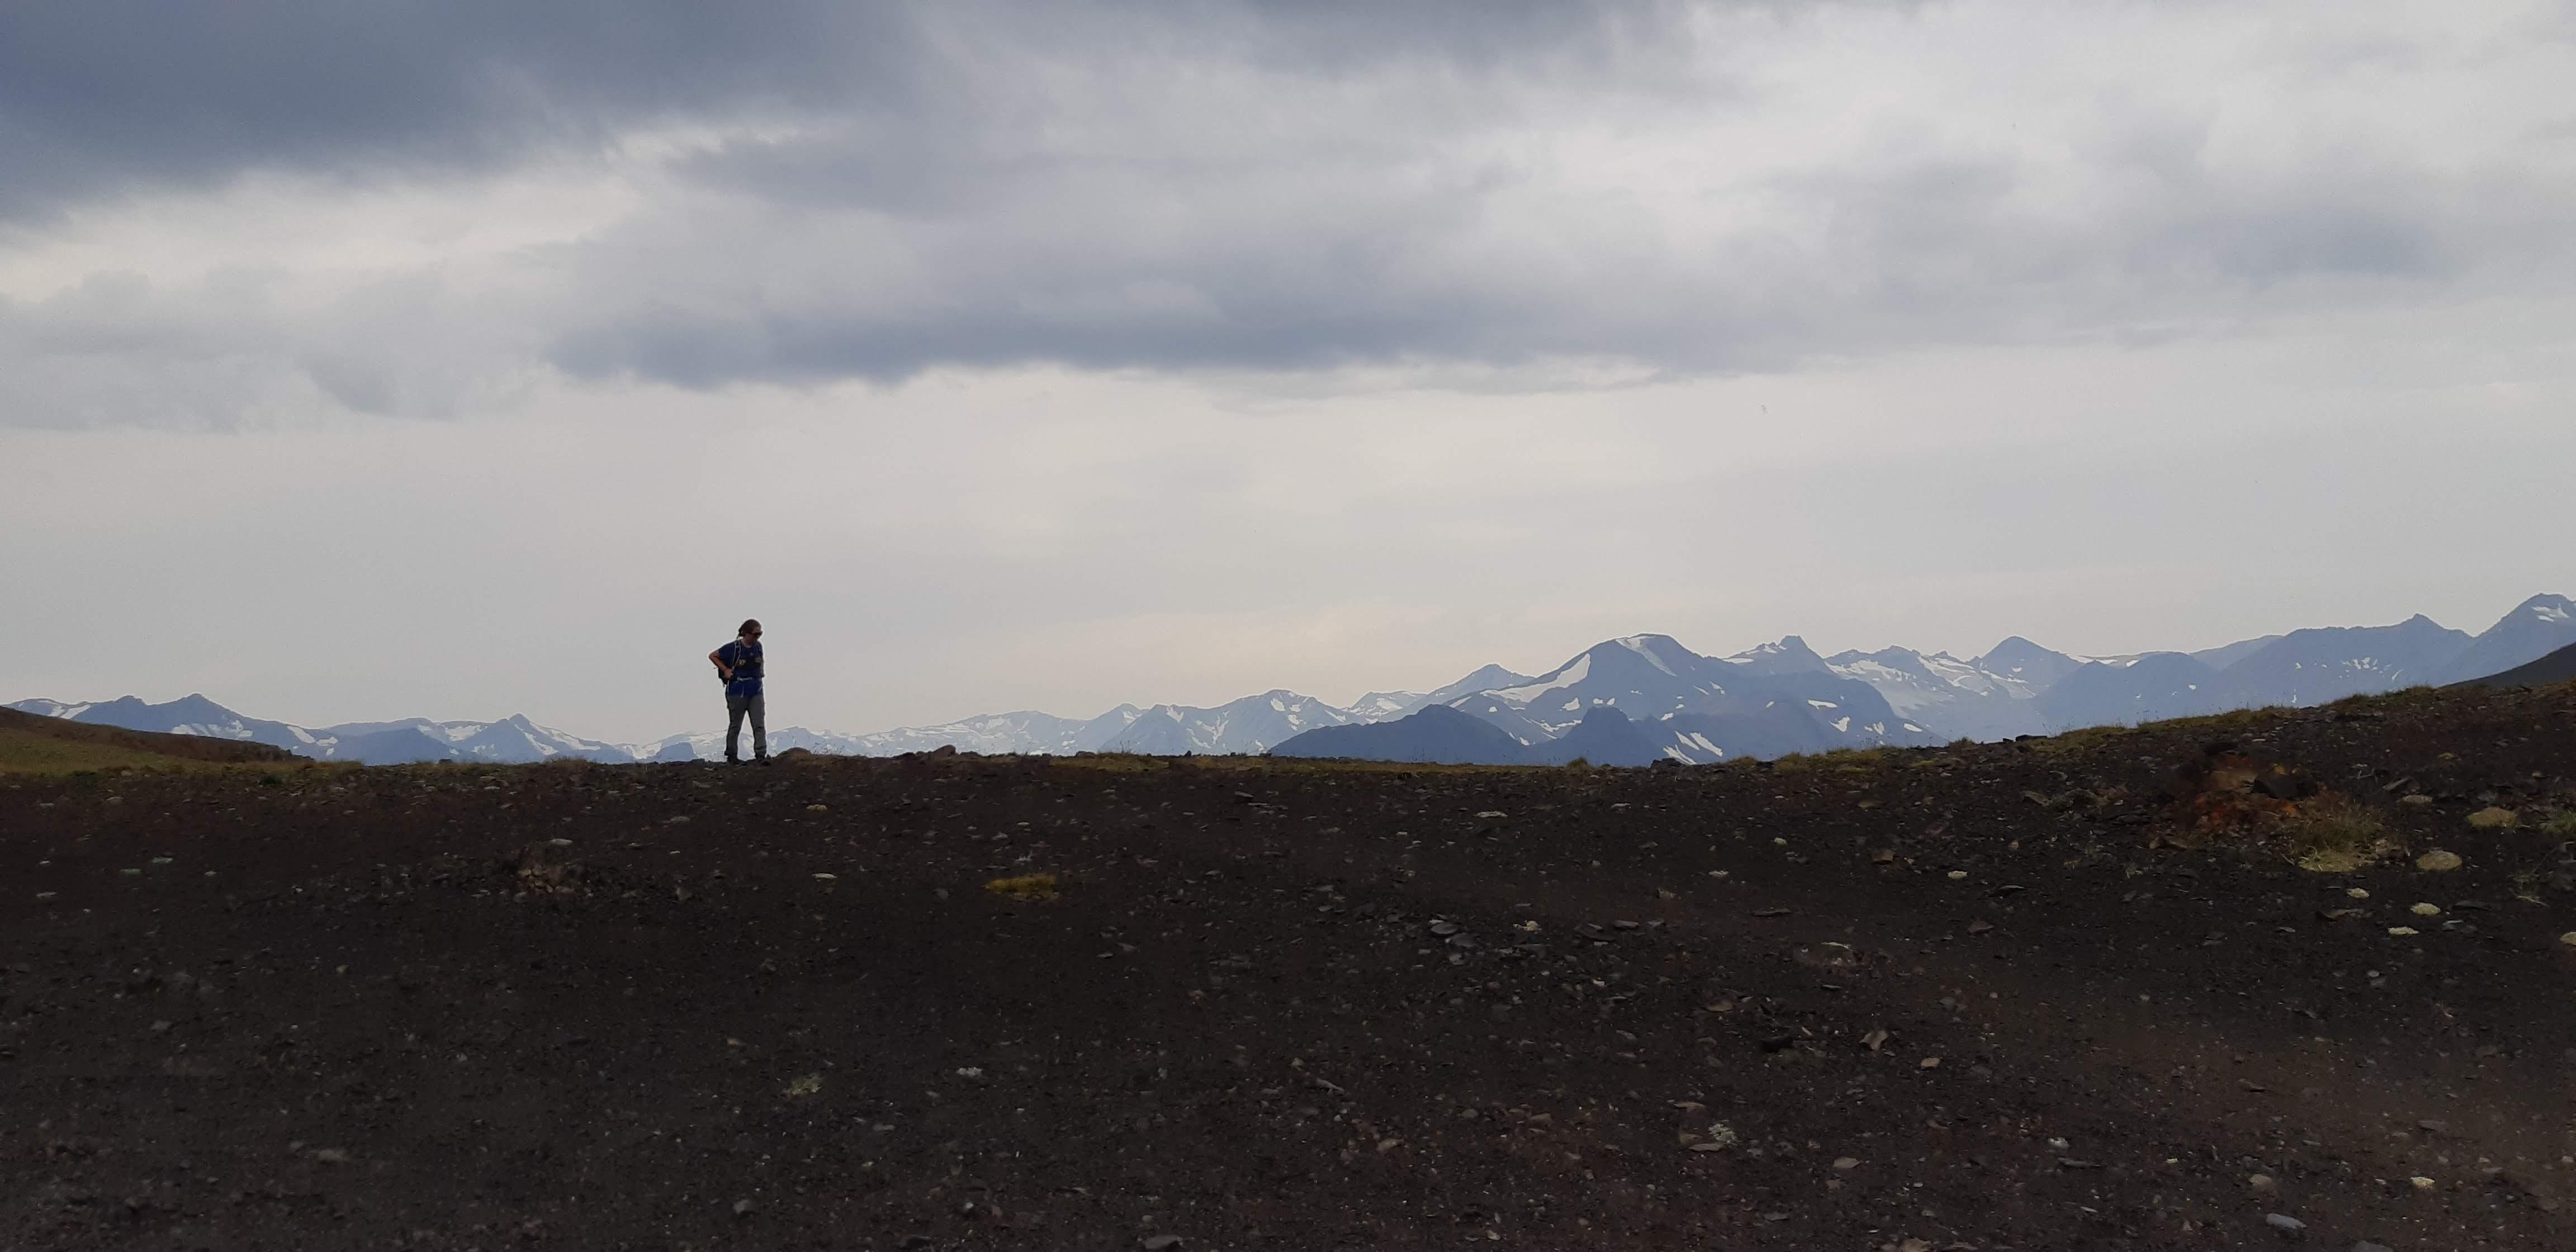 Melissa at Deer Pass. Photo by Shuyu